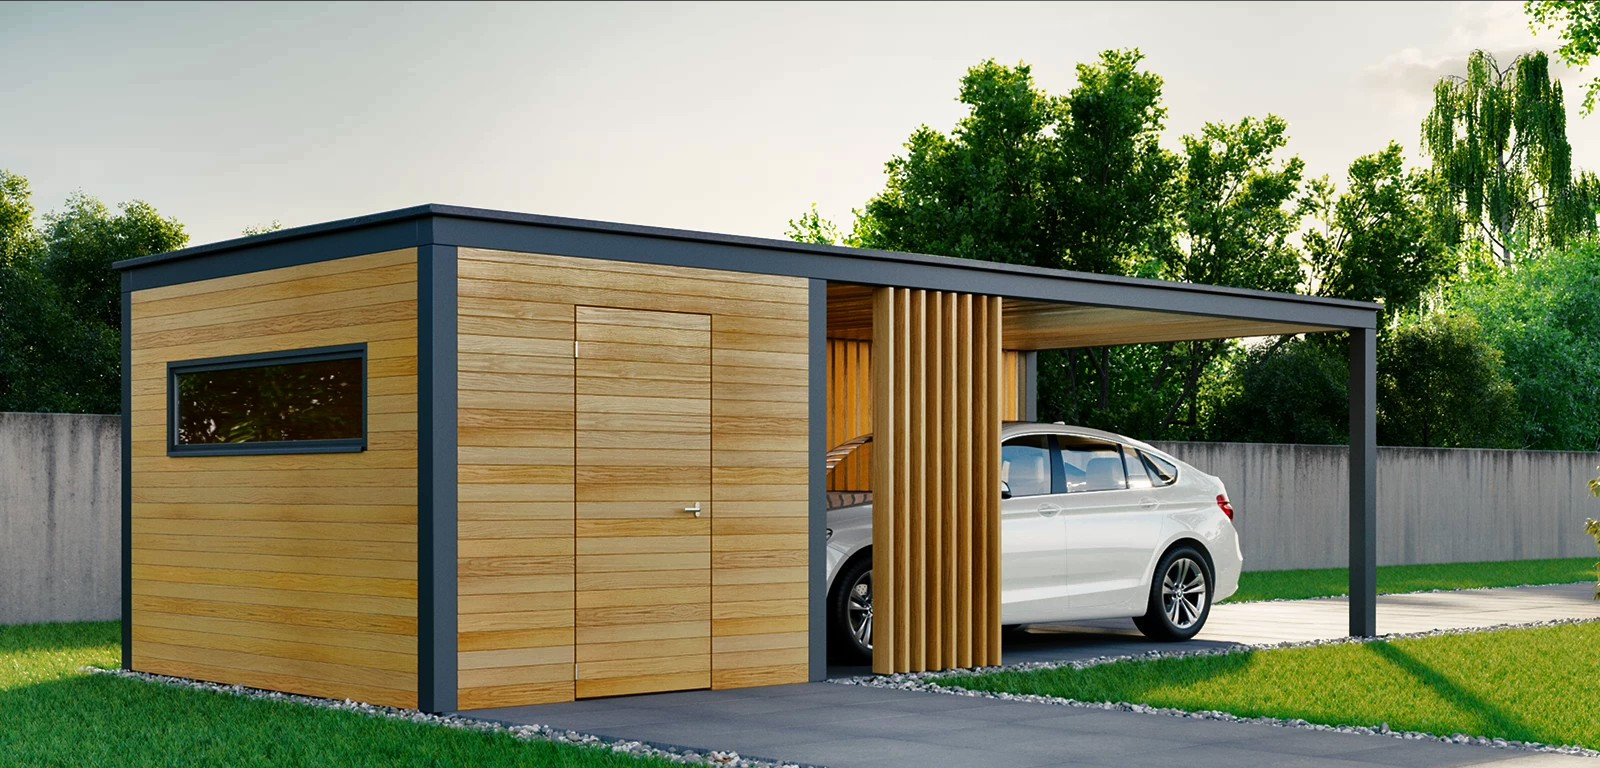 Carport- Wiata garażowa CP-800